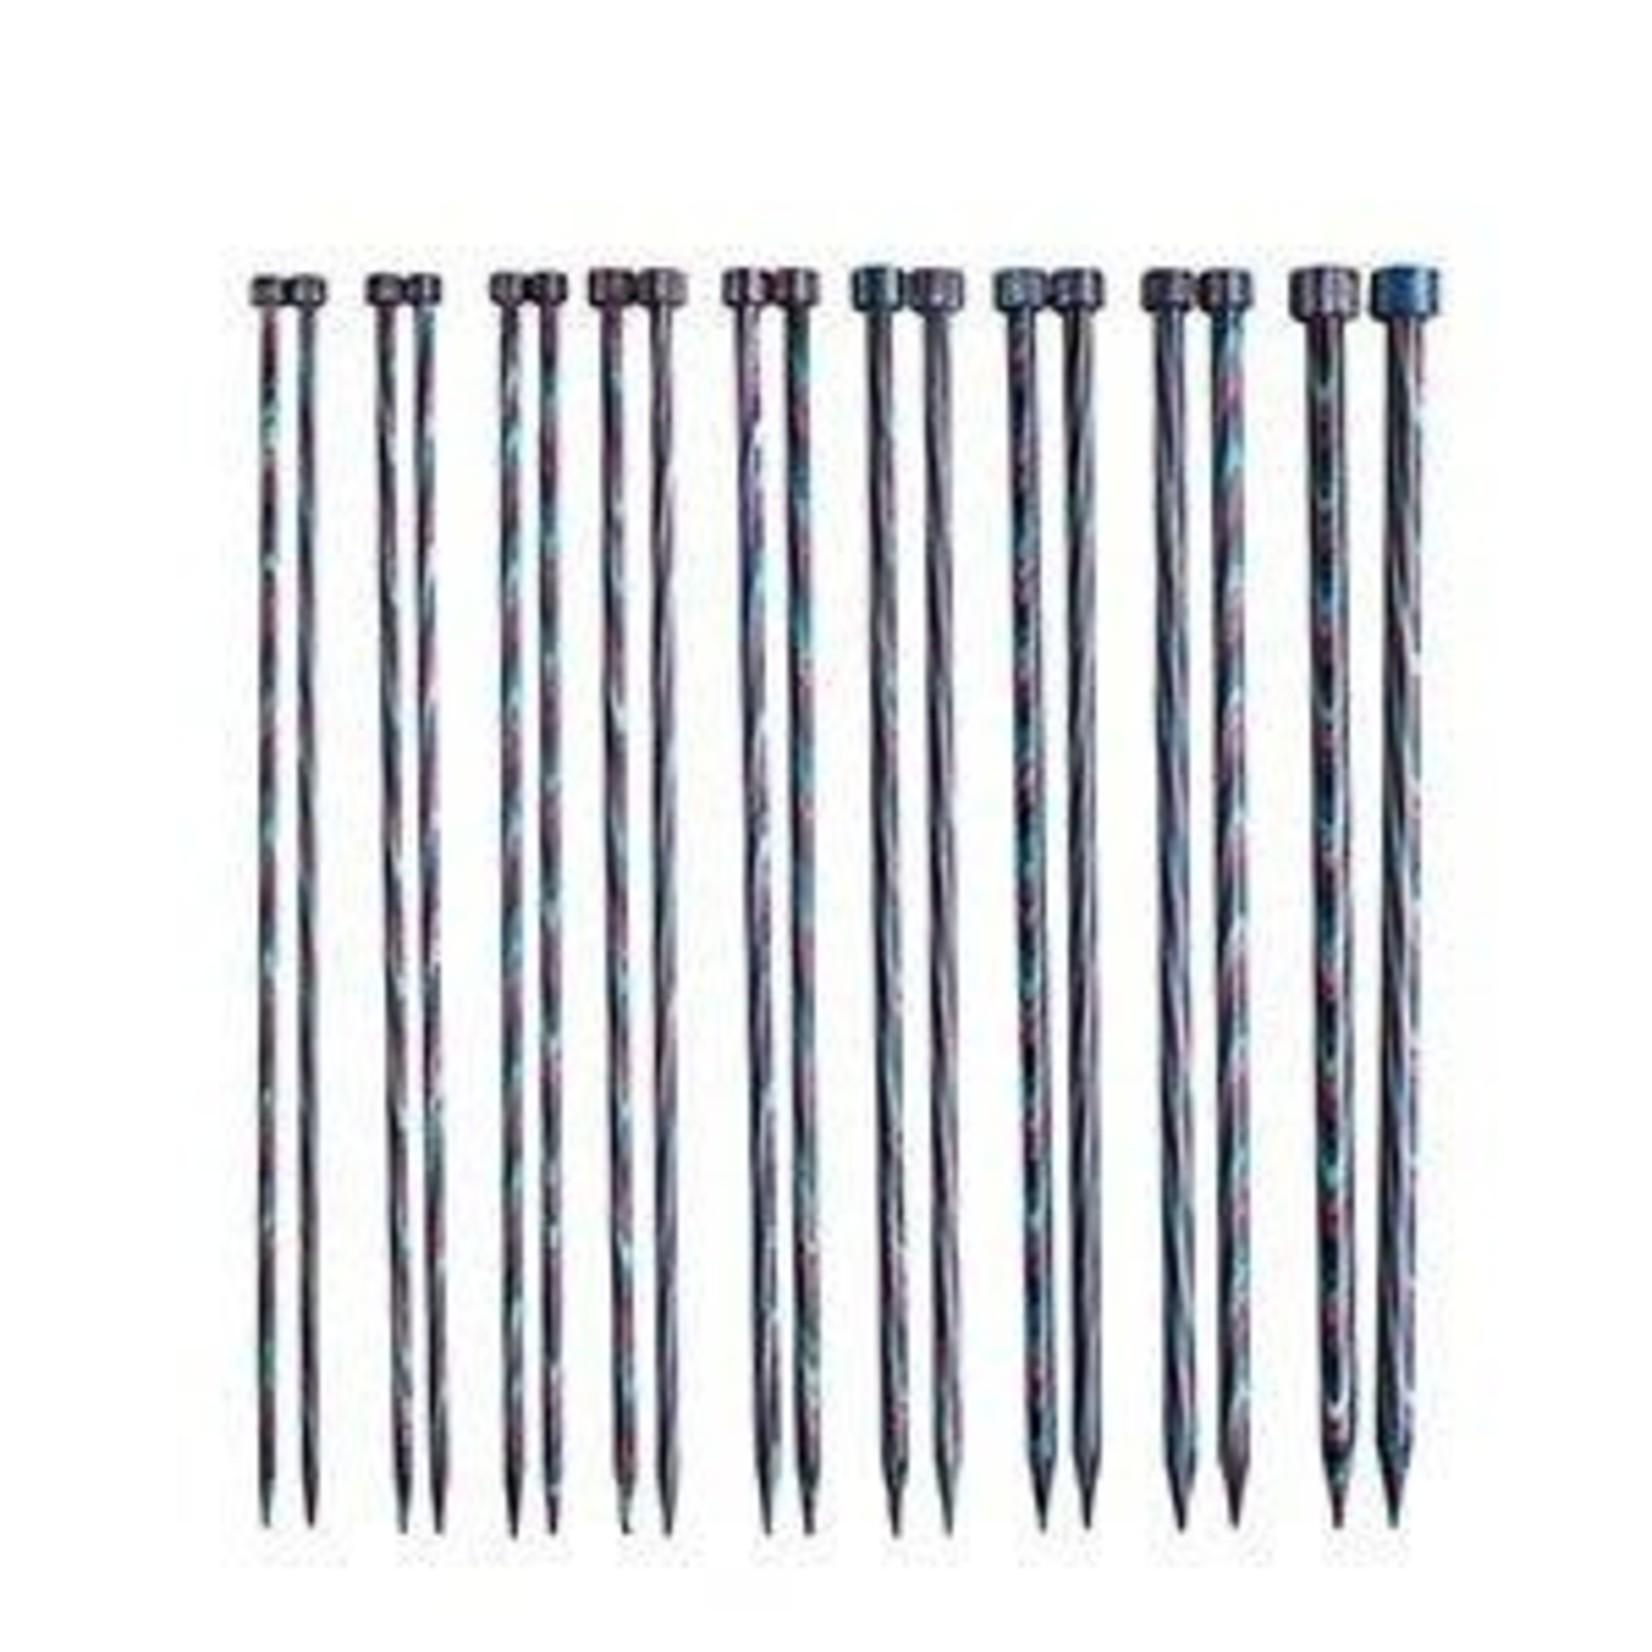 "Knit Picks KNIT PICKS Rainbow Wood Single Point Knitting Needles 25cm (10"")"